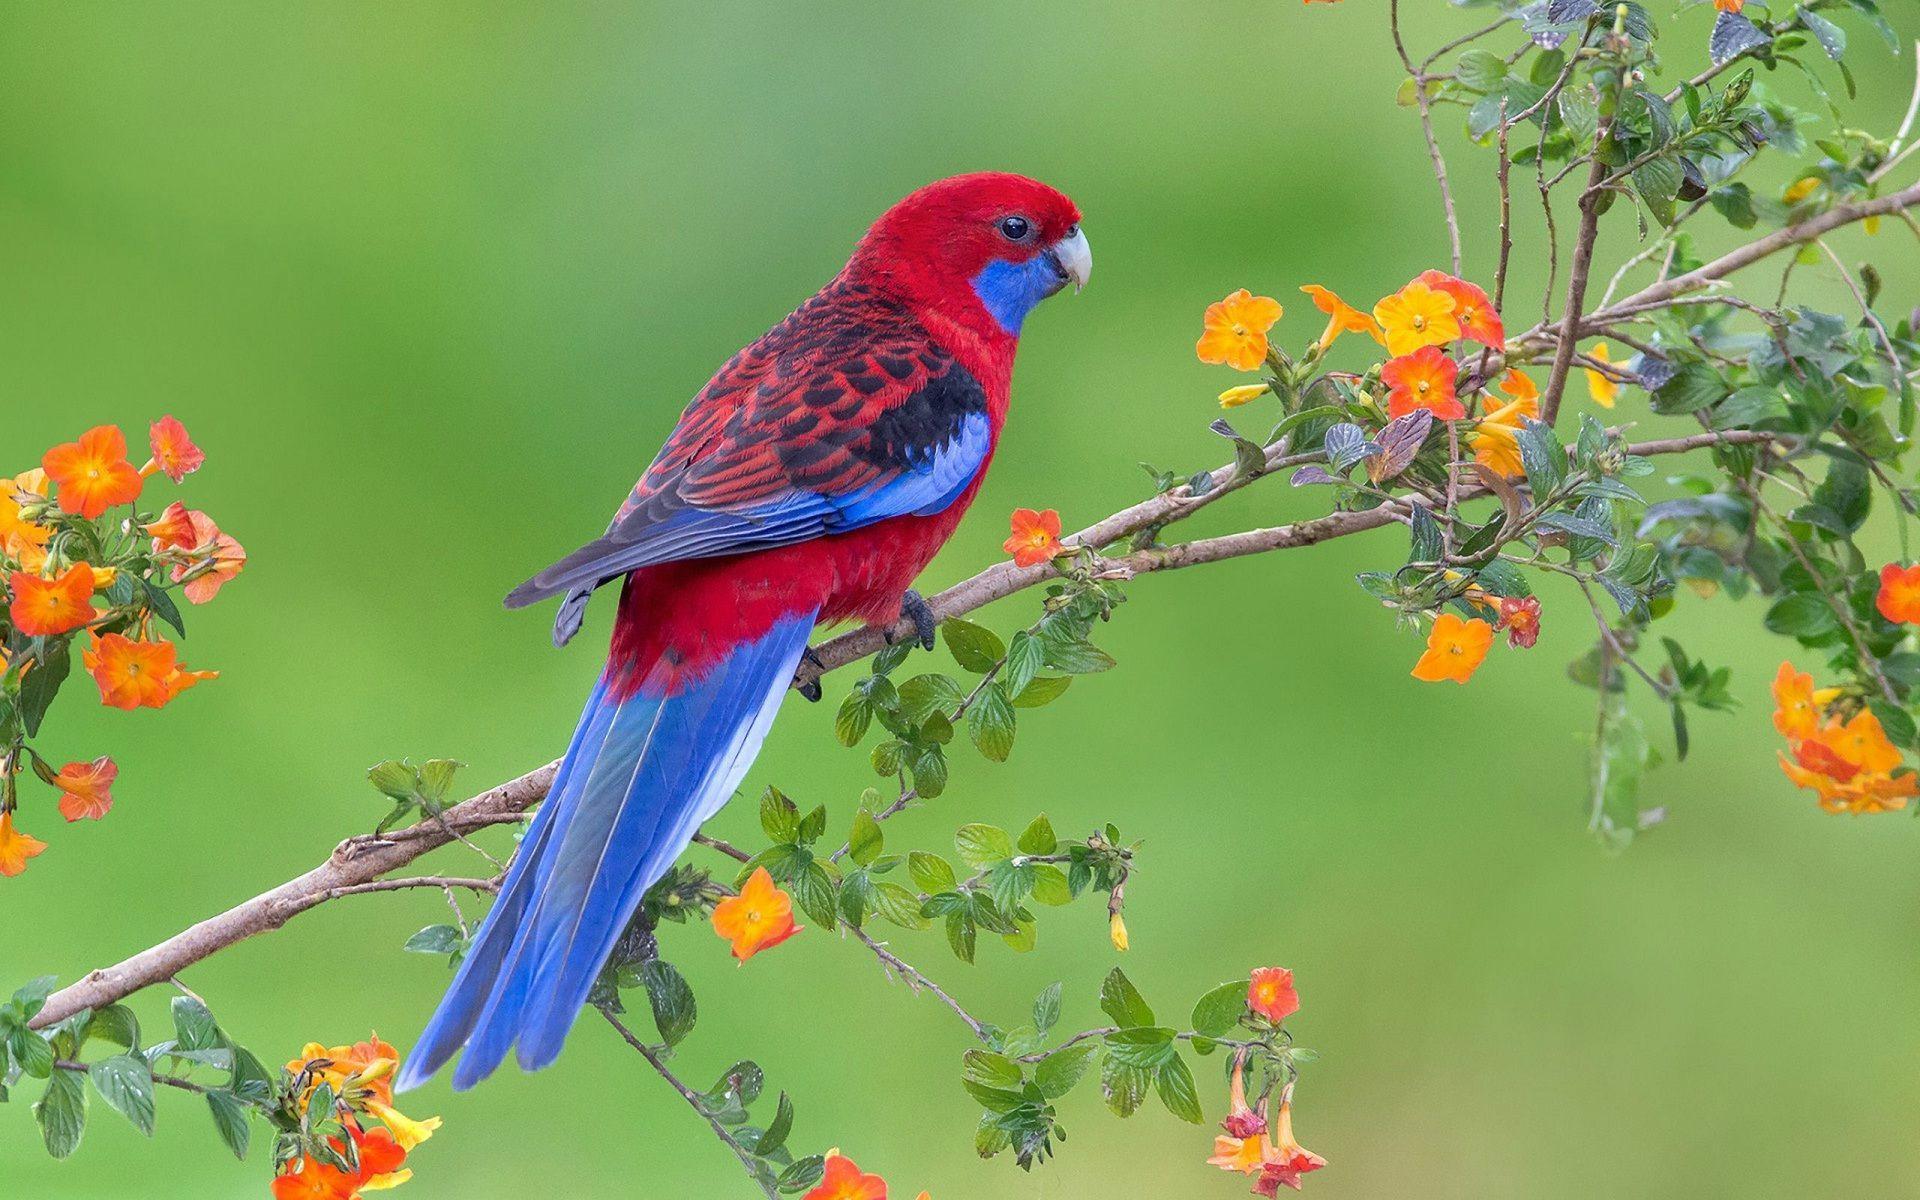 1920x1080 Beautiful Red Parrot Bird Hd Wallpaper Hd Wallpapers